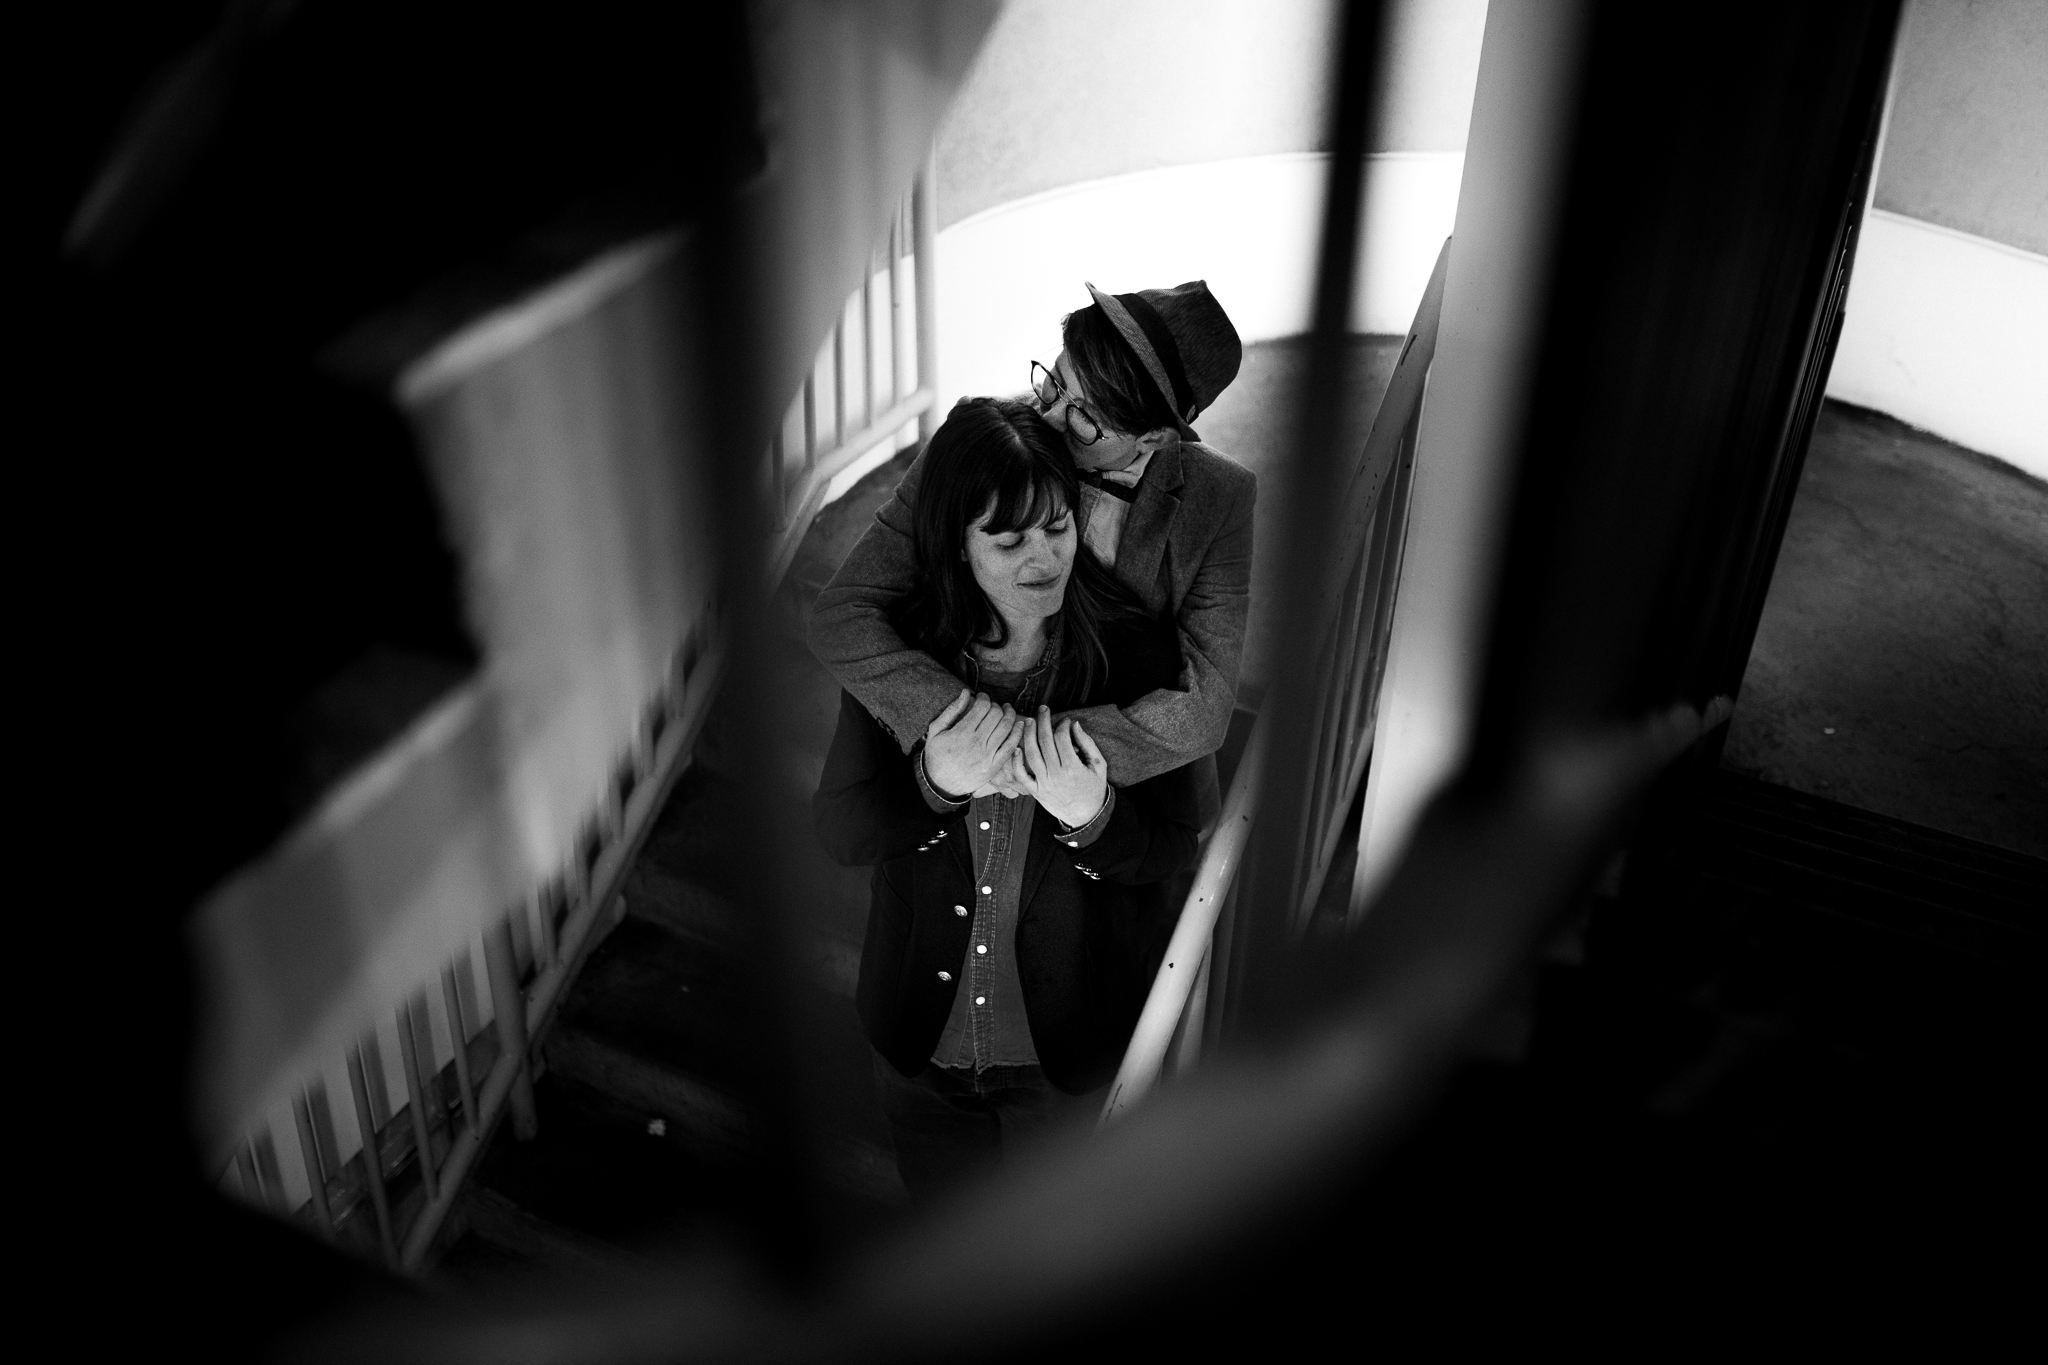 Archer Inspired Photography Hilary and Gia LGTBQ Reno Nevada Couple Wedding Engagement Photographer-58.jpg